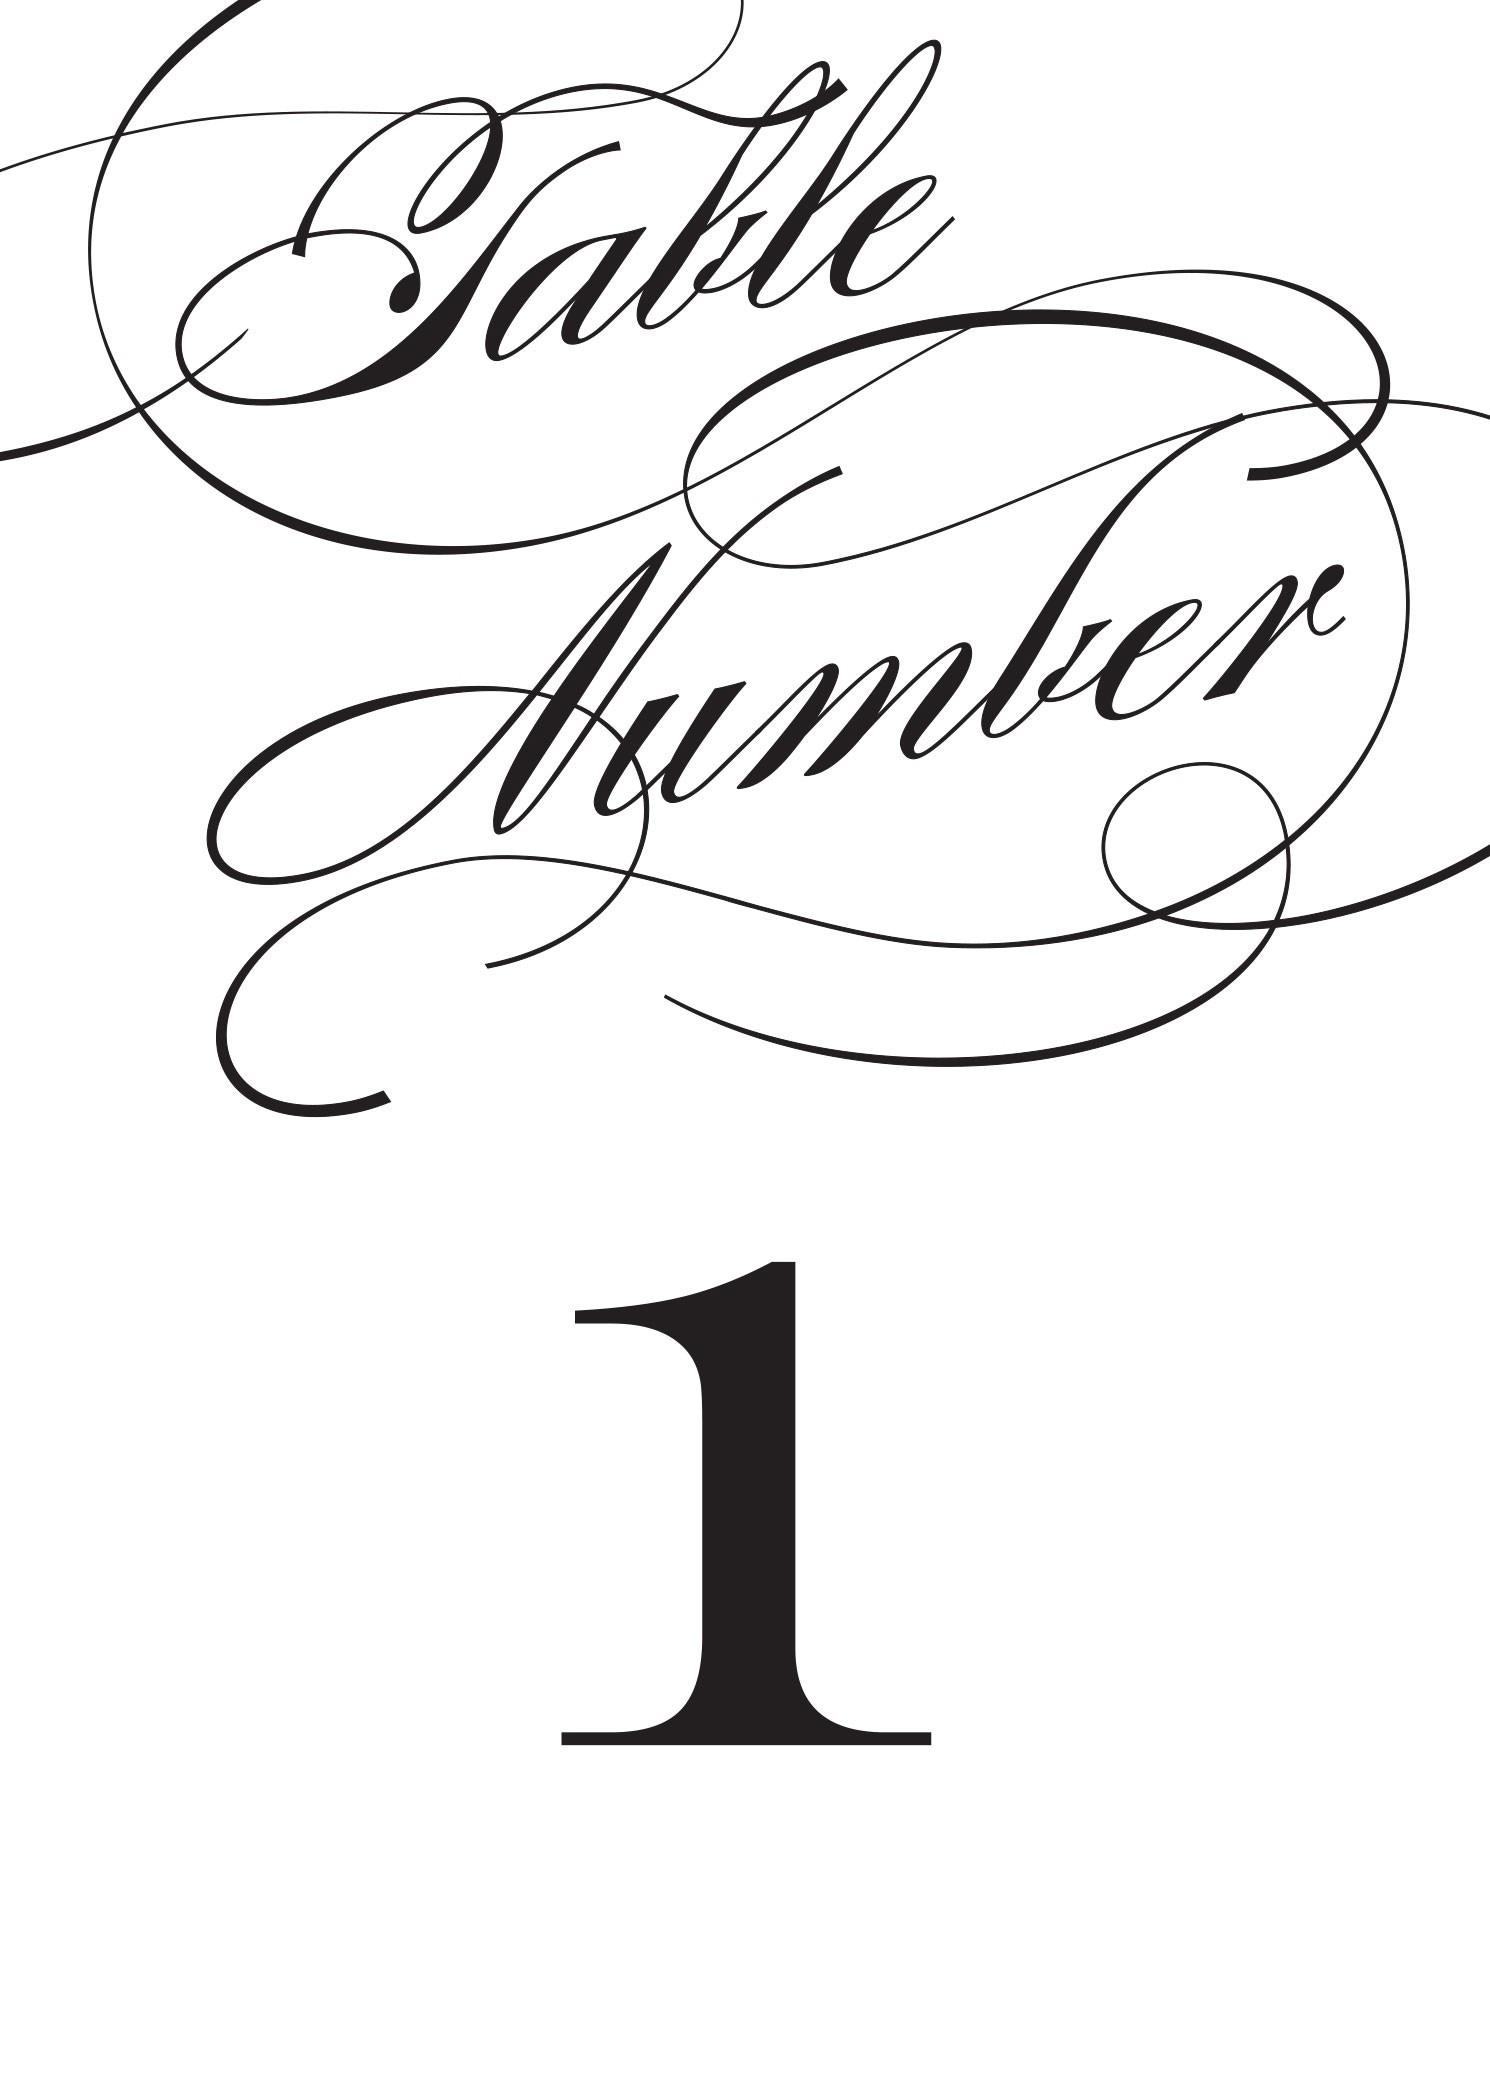 Wedding Table Numbers | Printable Pdfbasic Invite - Free Printable Table Numbers 1 20